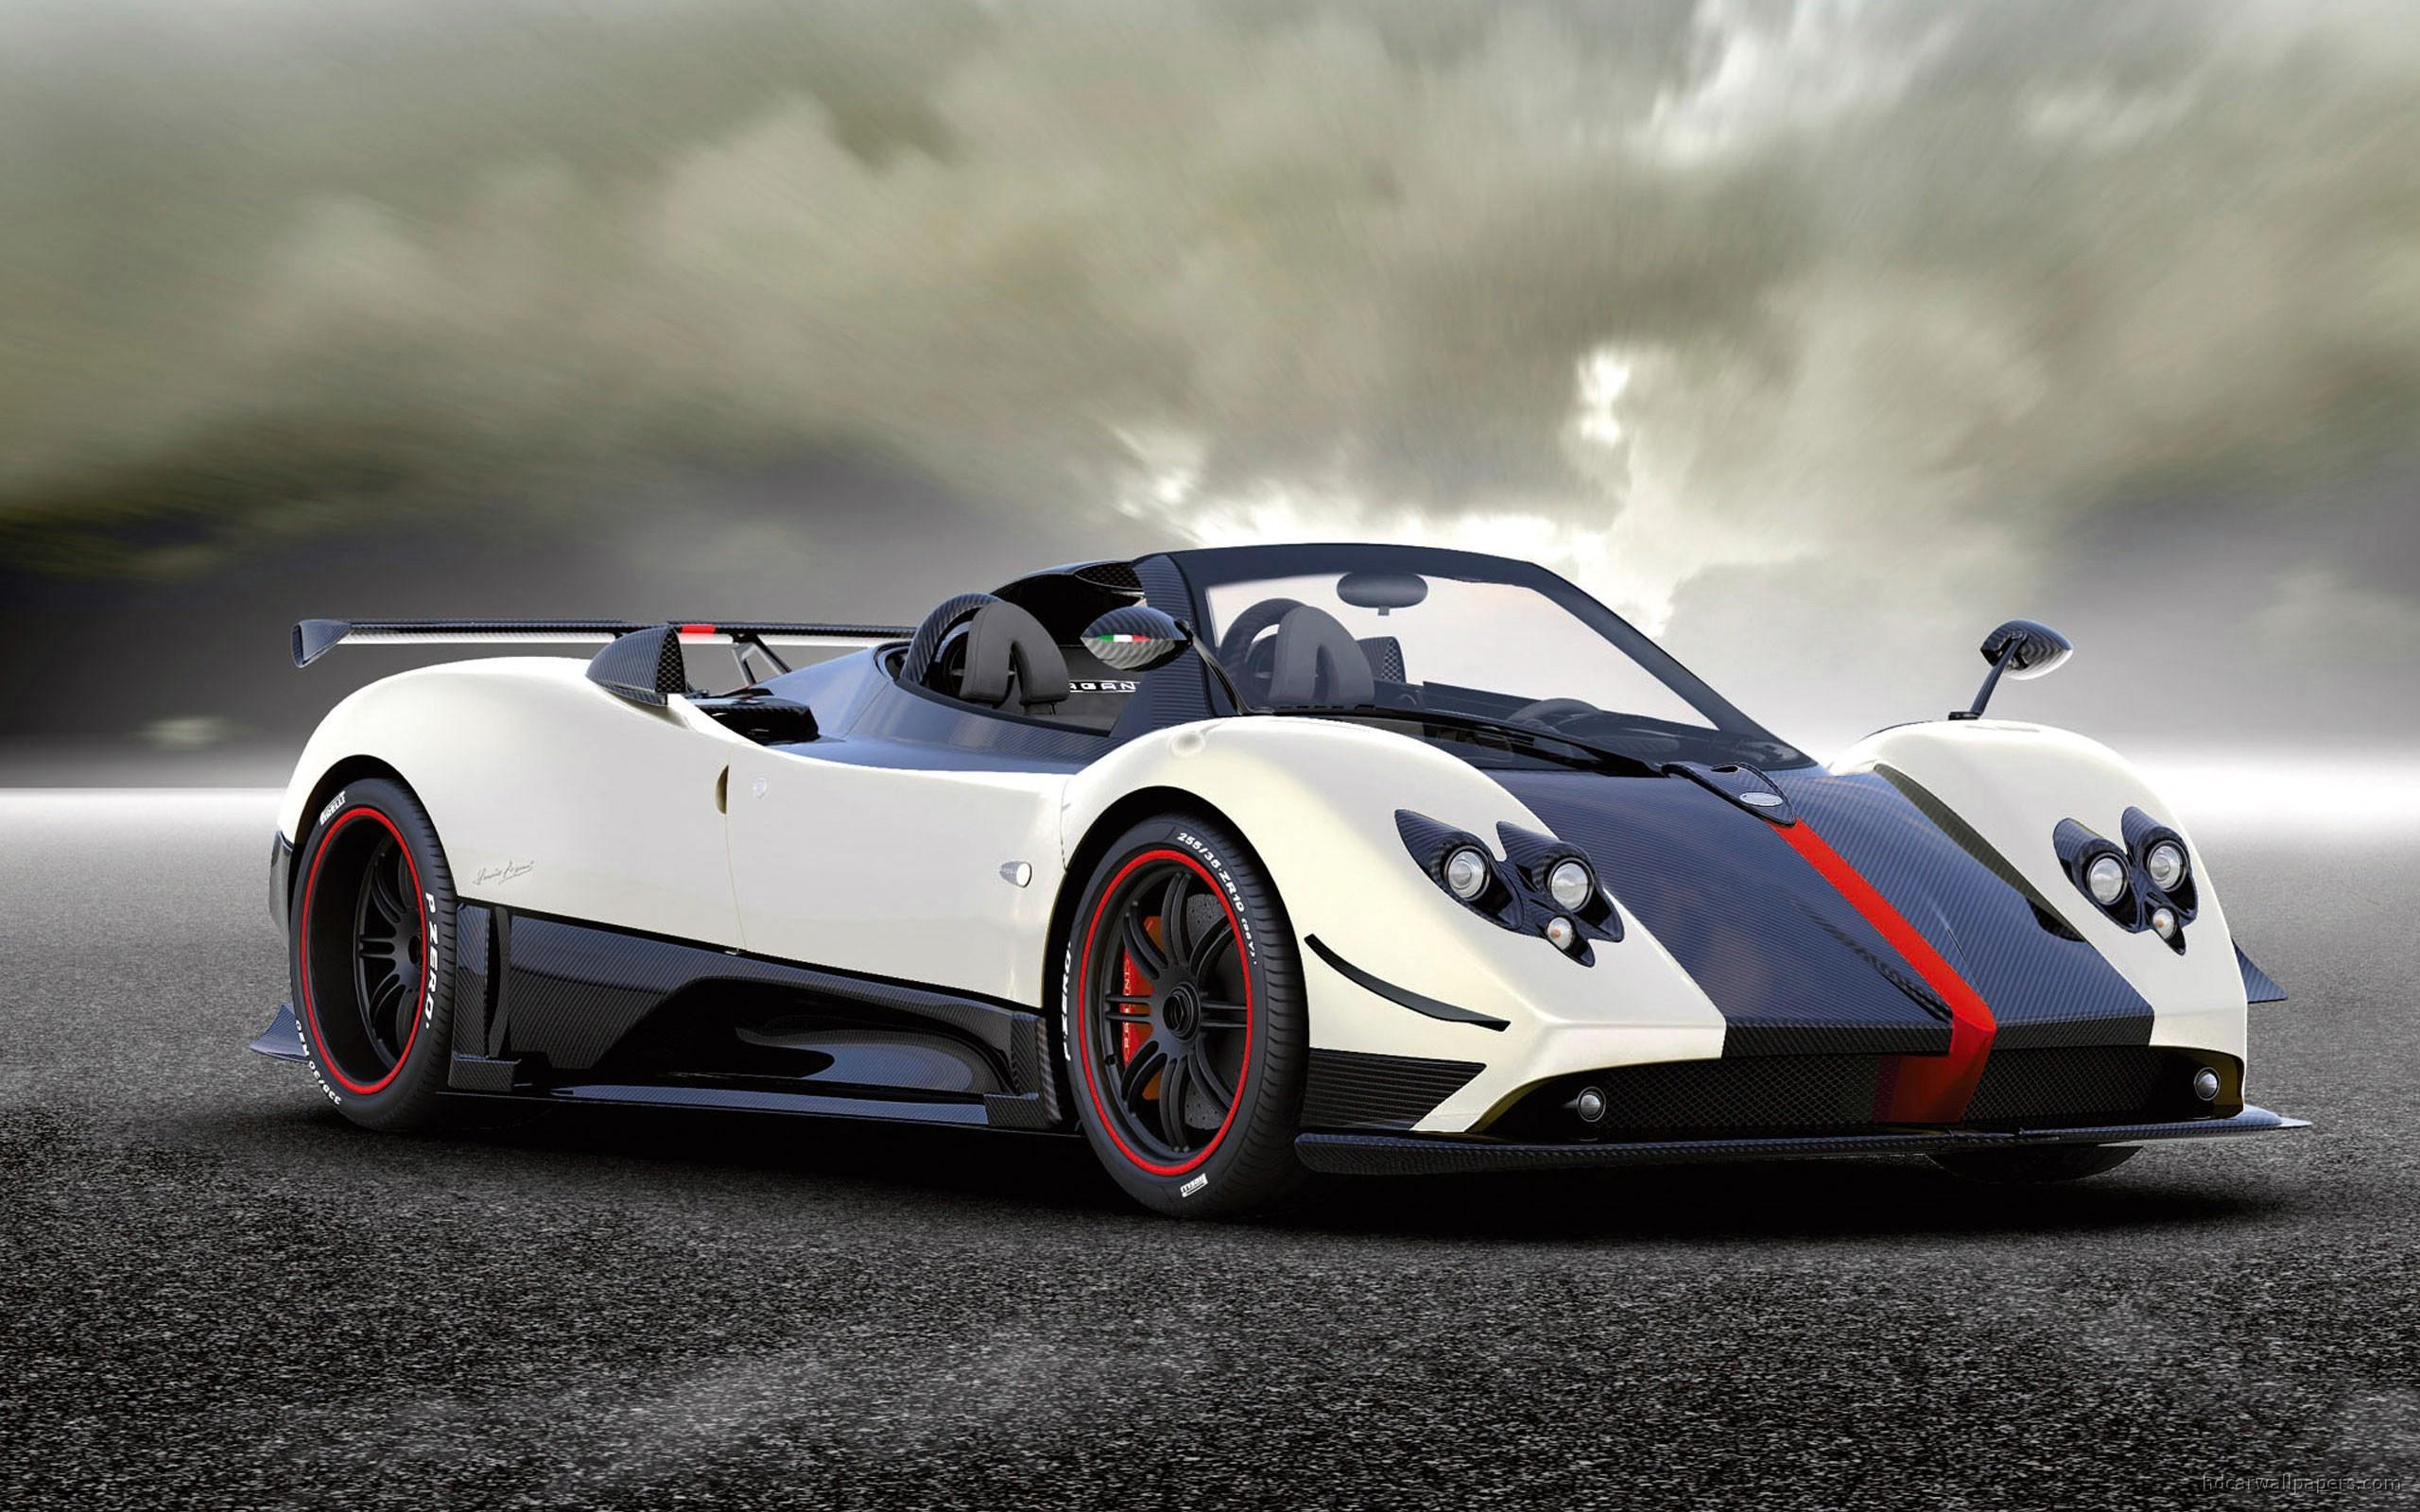 31282 views Pagani Zonda Cinque Roadster 2